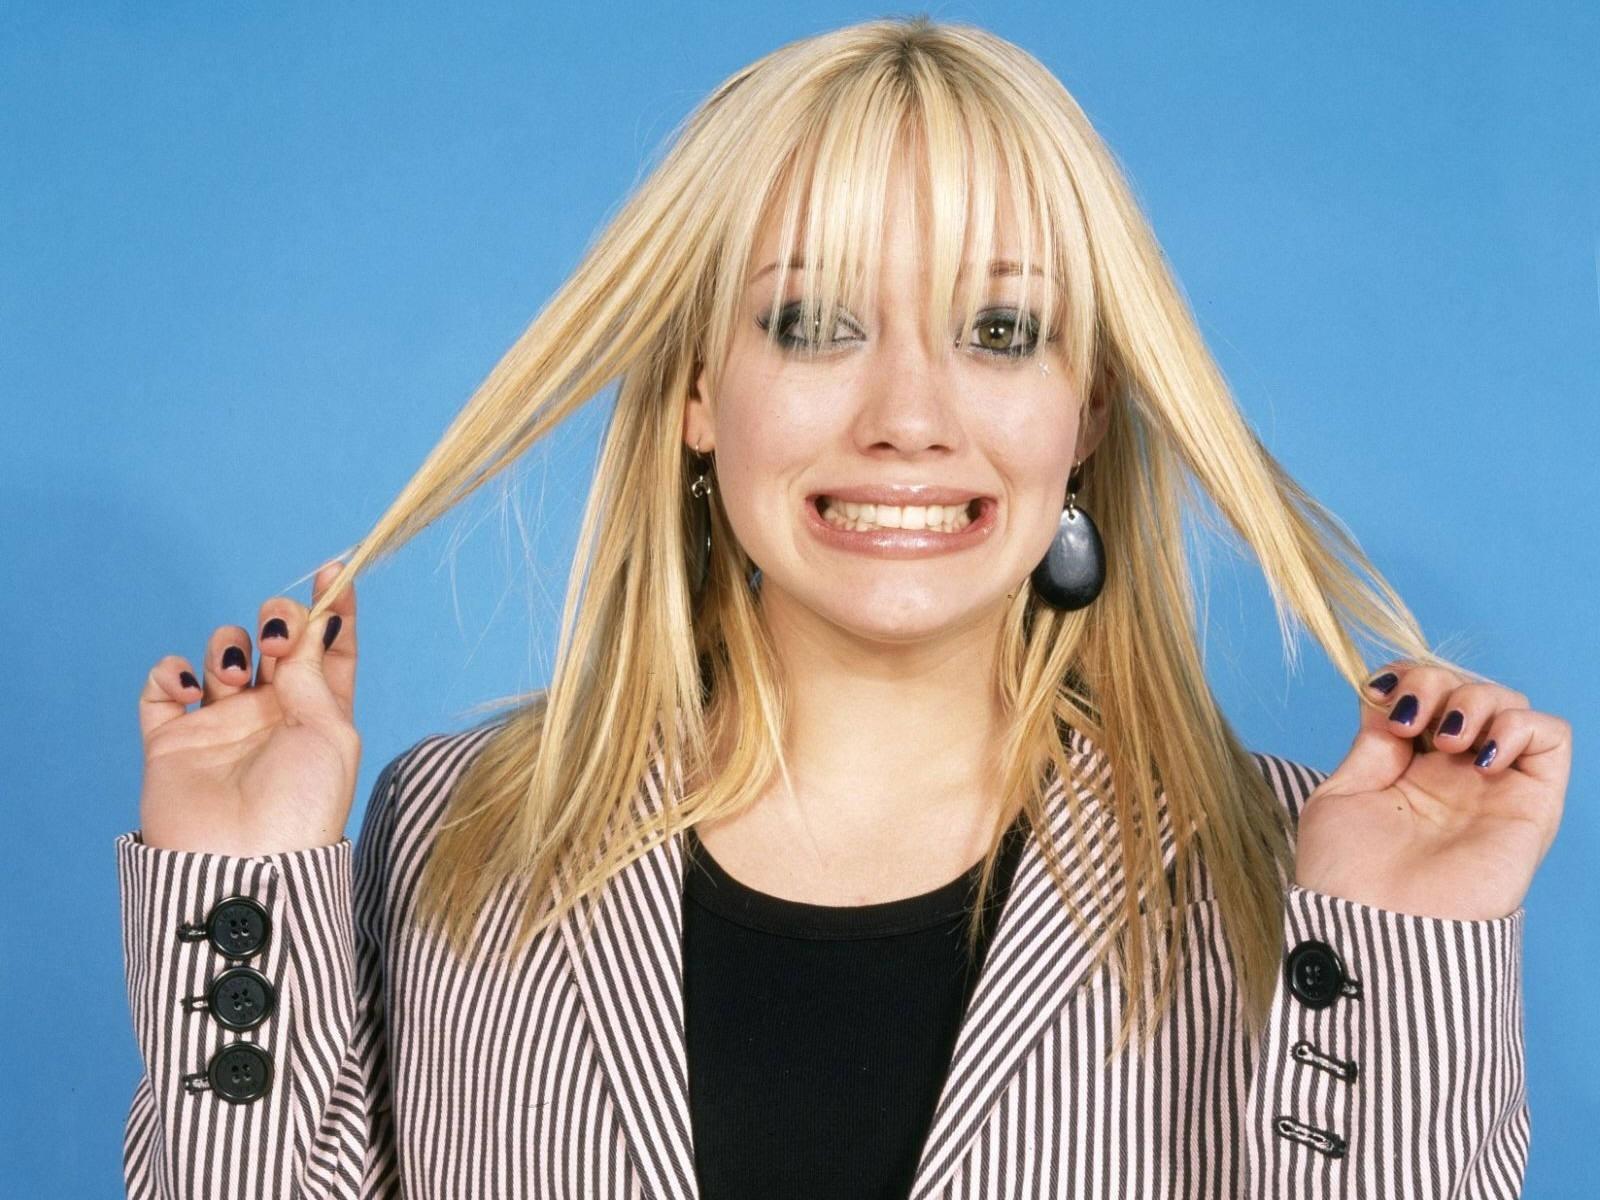 Wallpaper di Hilary Duff - 55